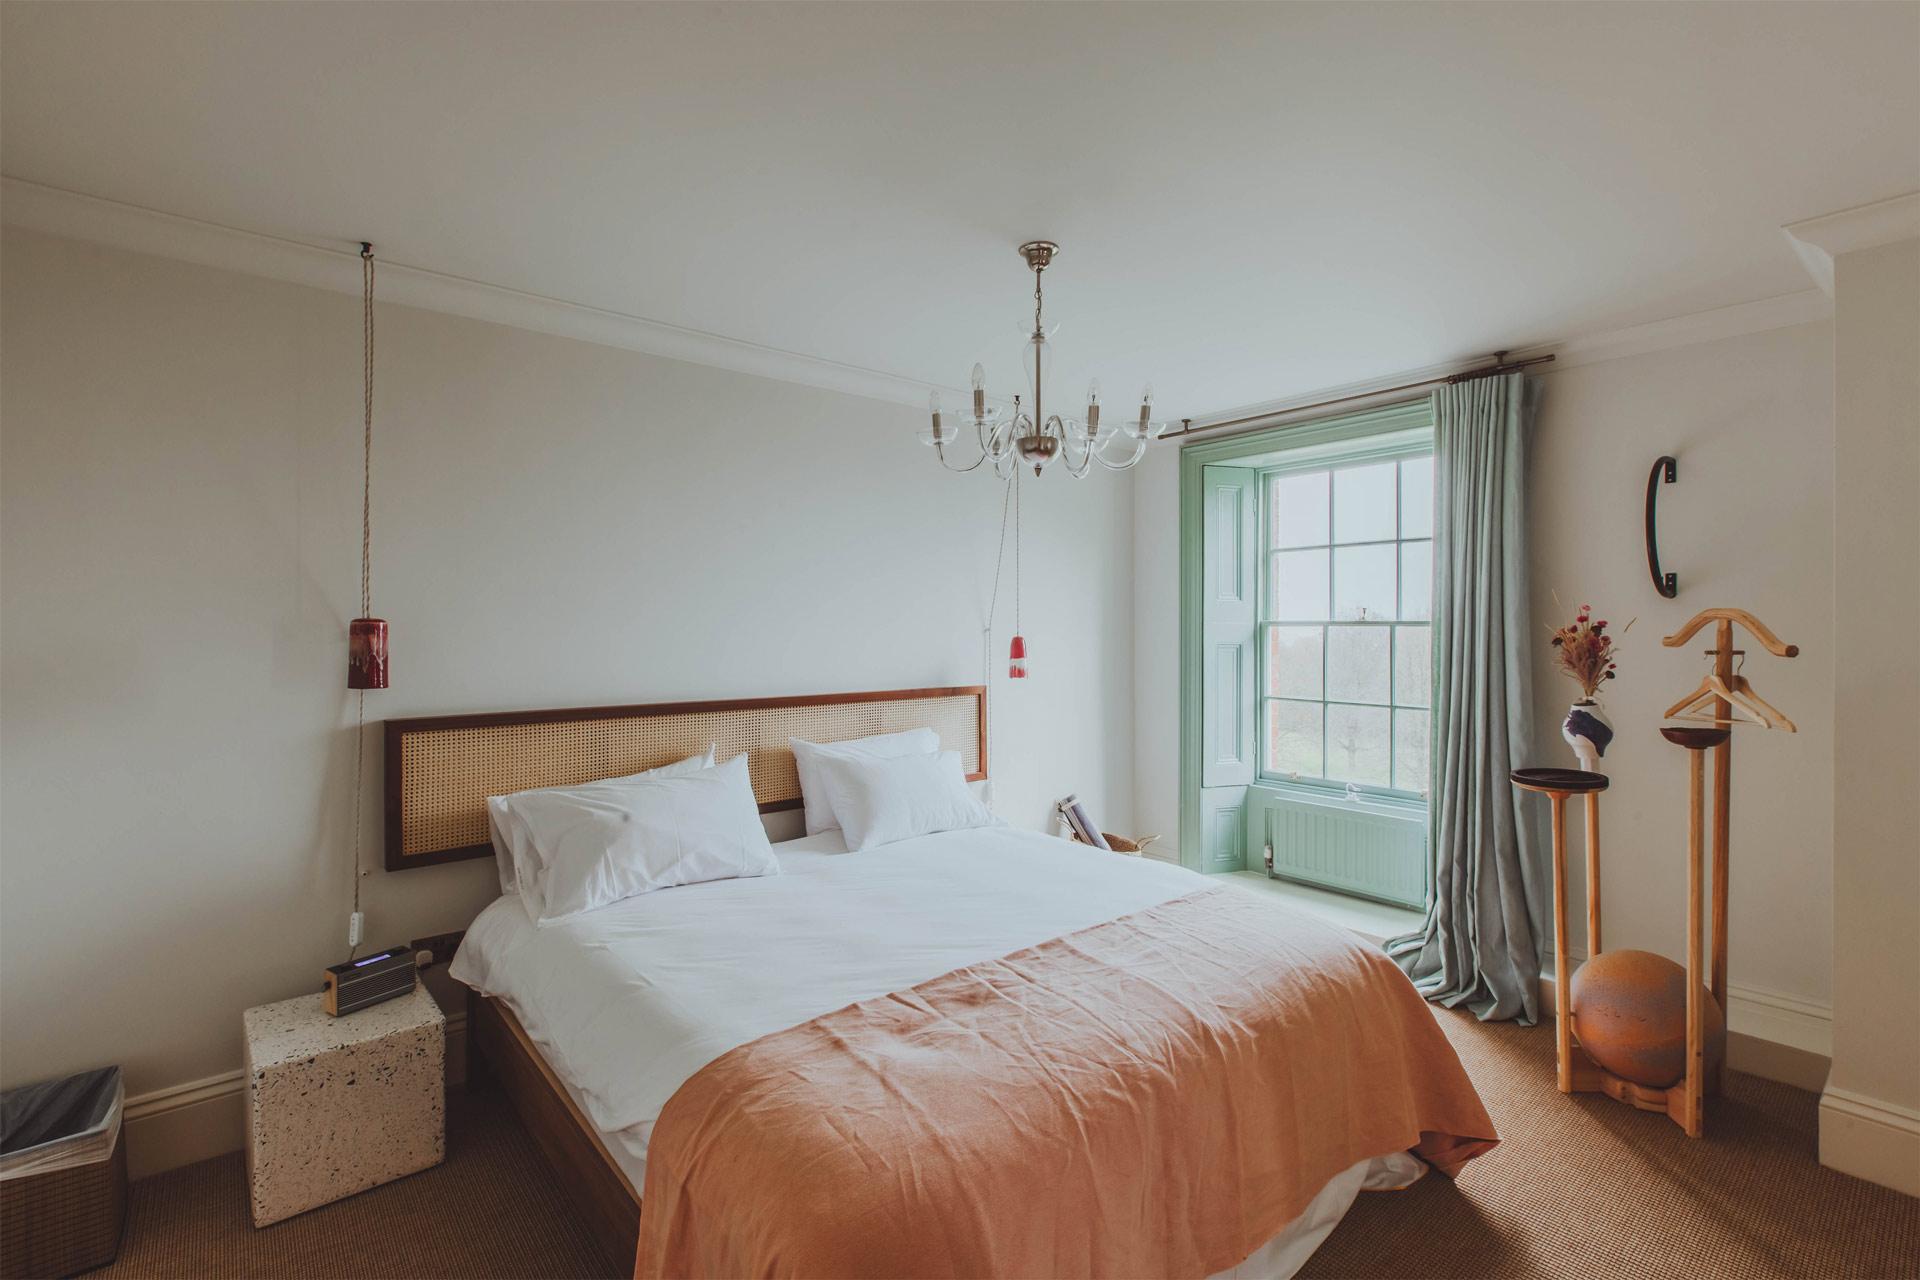 A guestroom at Birch in Cheshunt, Hertfordshire